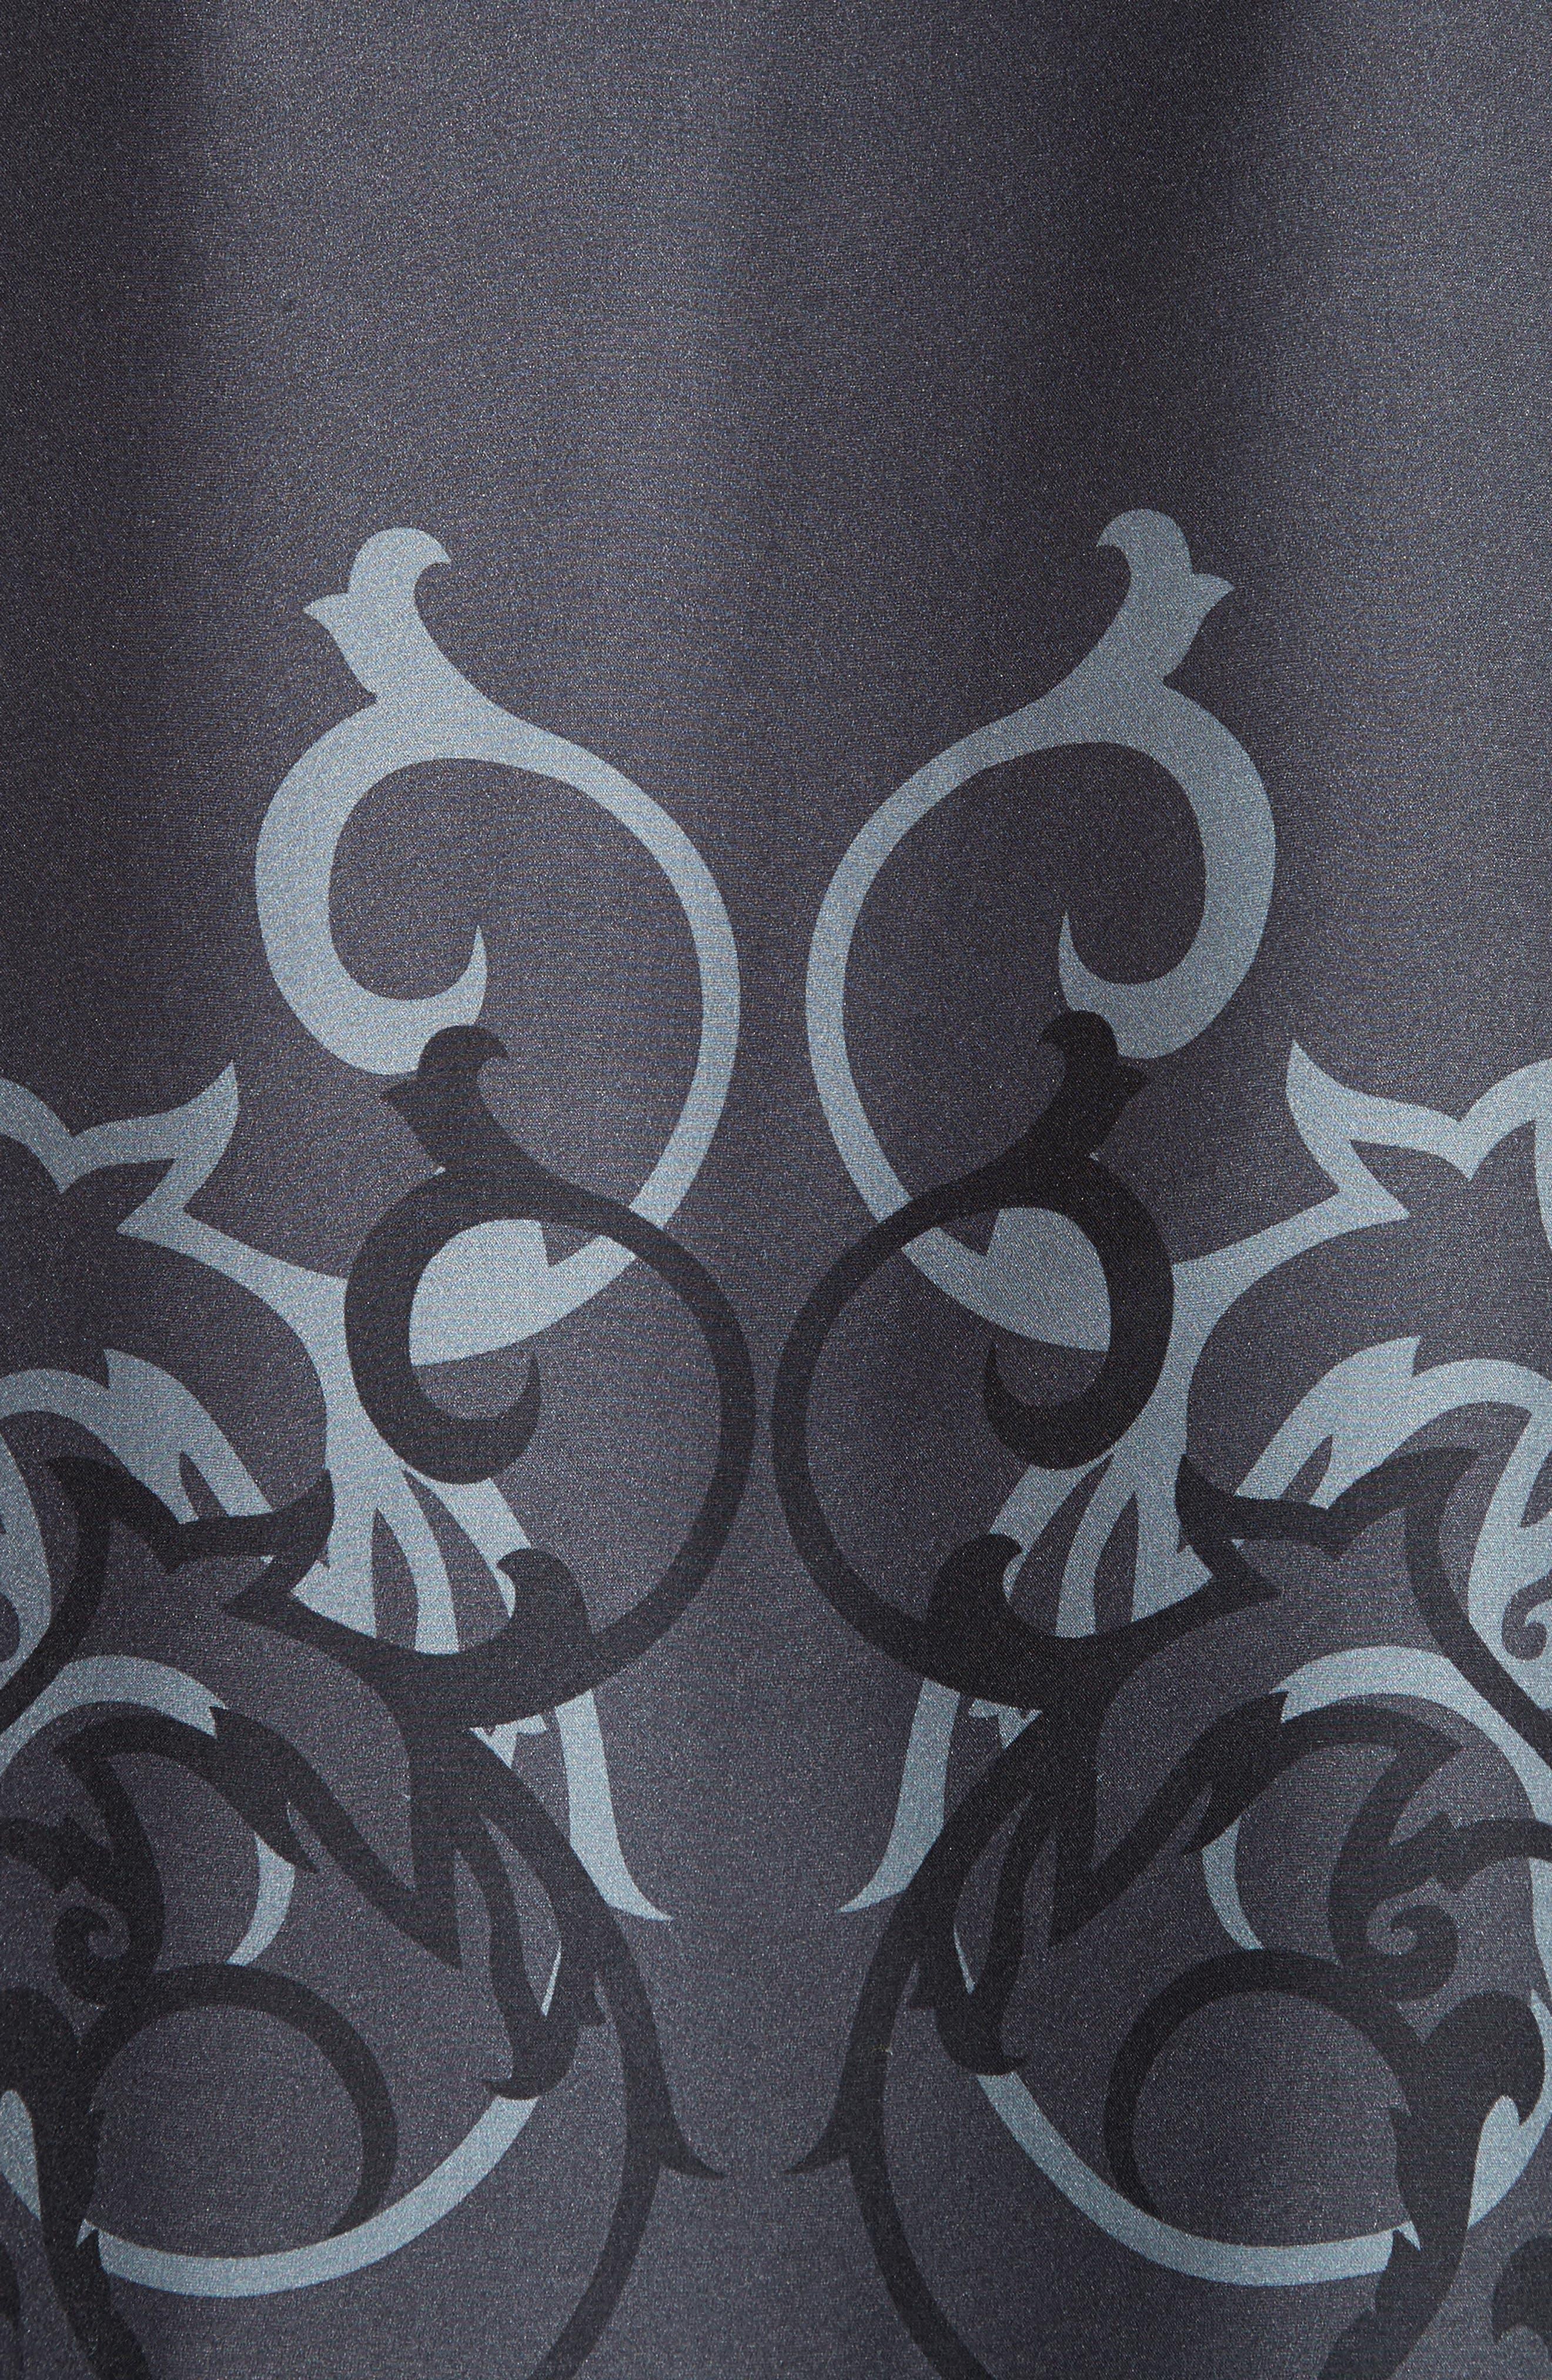 Baroque Print Silk Blouse,                             Alternate thumbnail 3, color,                             Black/ Grey